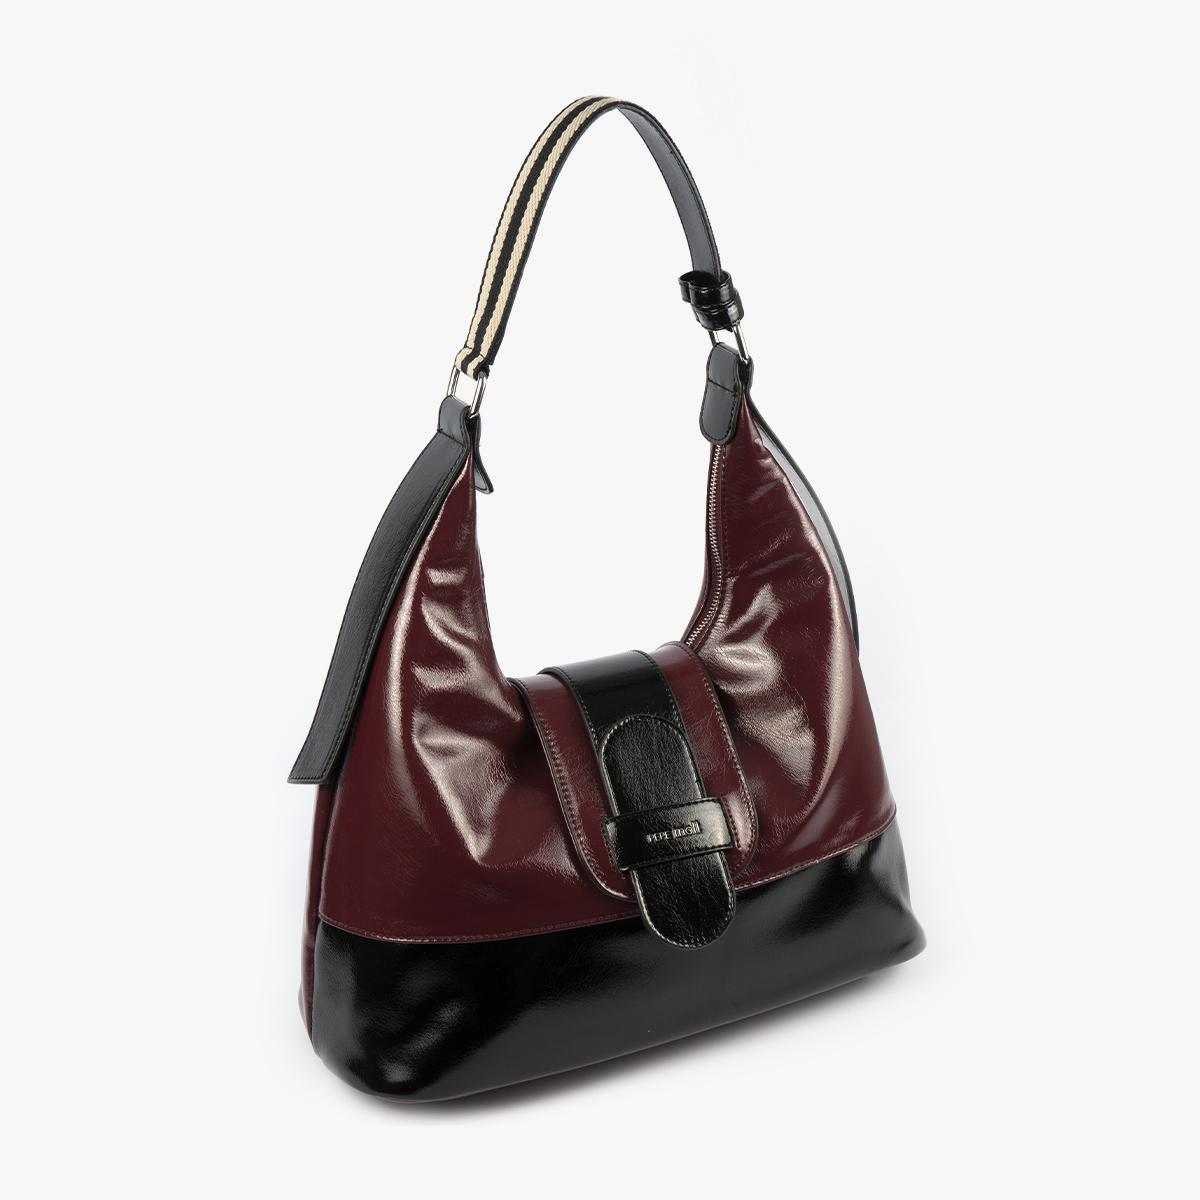 45117 vernice cherry vernice negro perfil